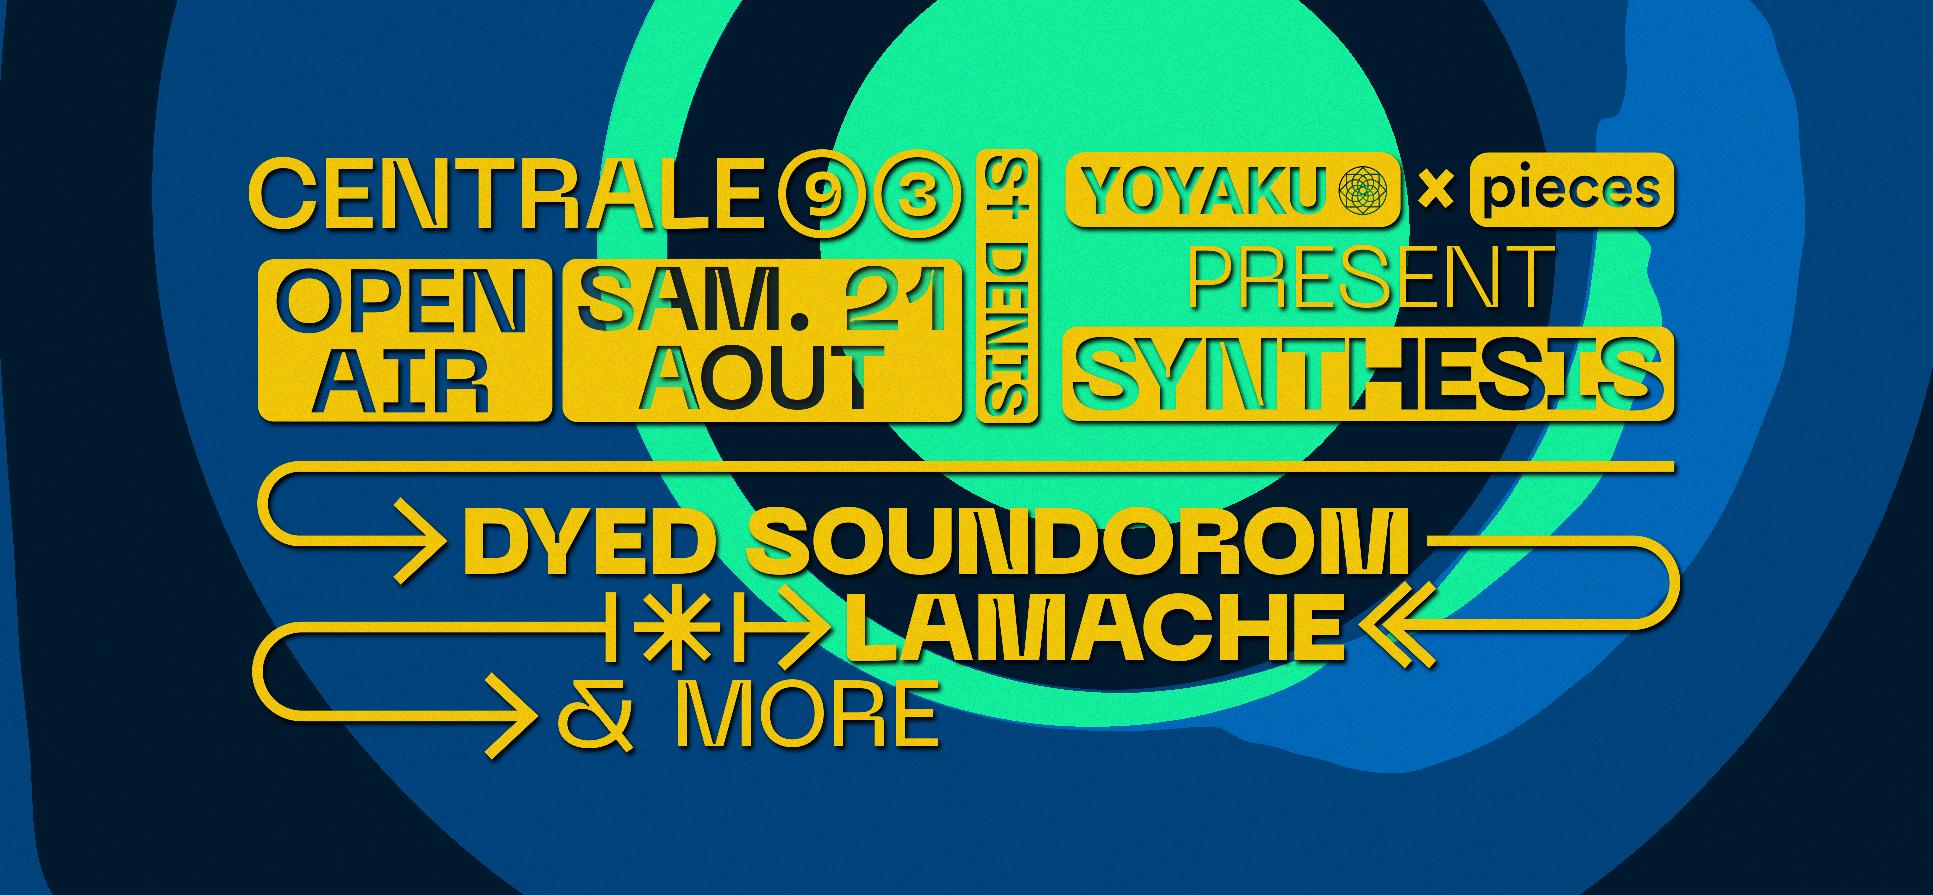 Yoyaku x pieces: Synthesis w/ Dyed Soundorom, Lamache